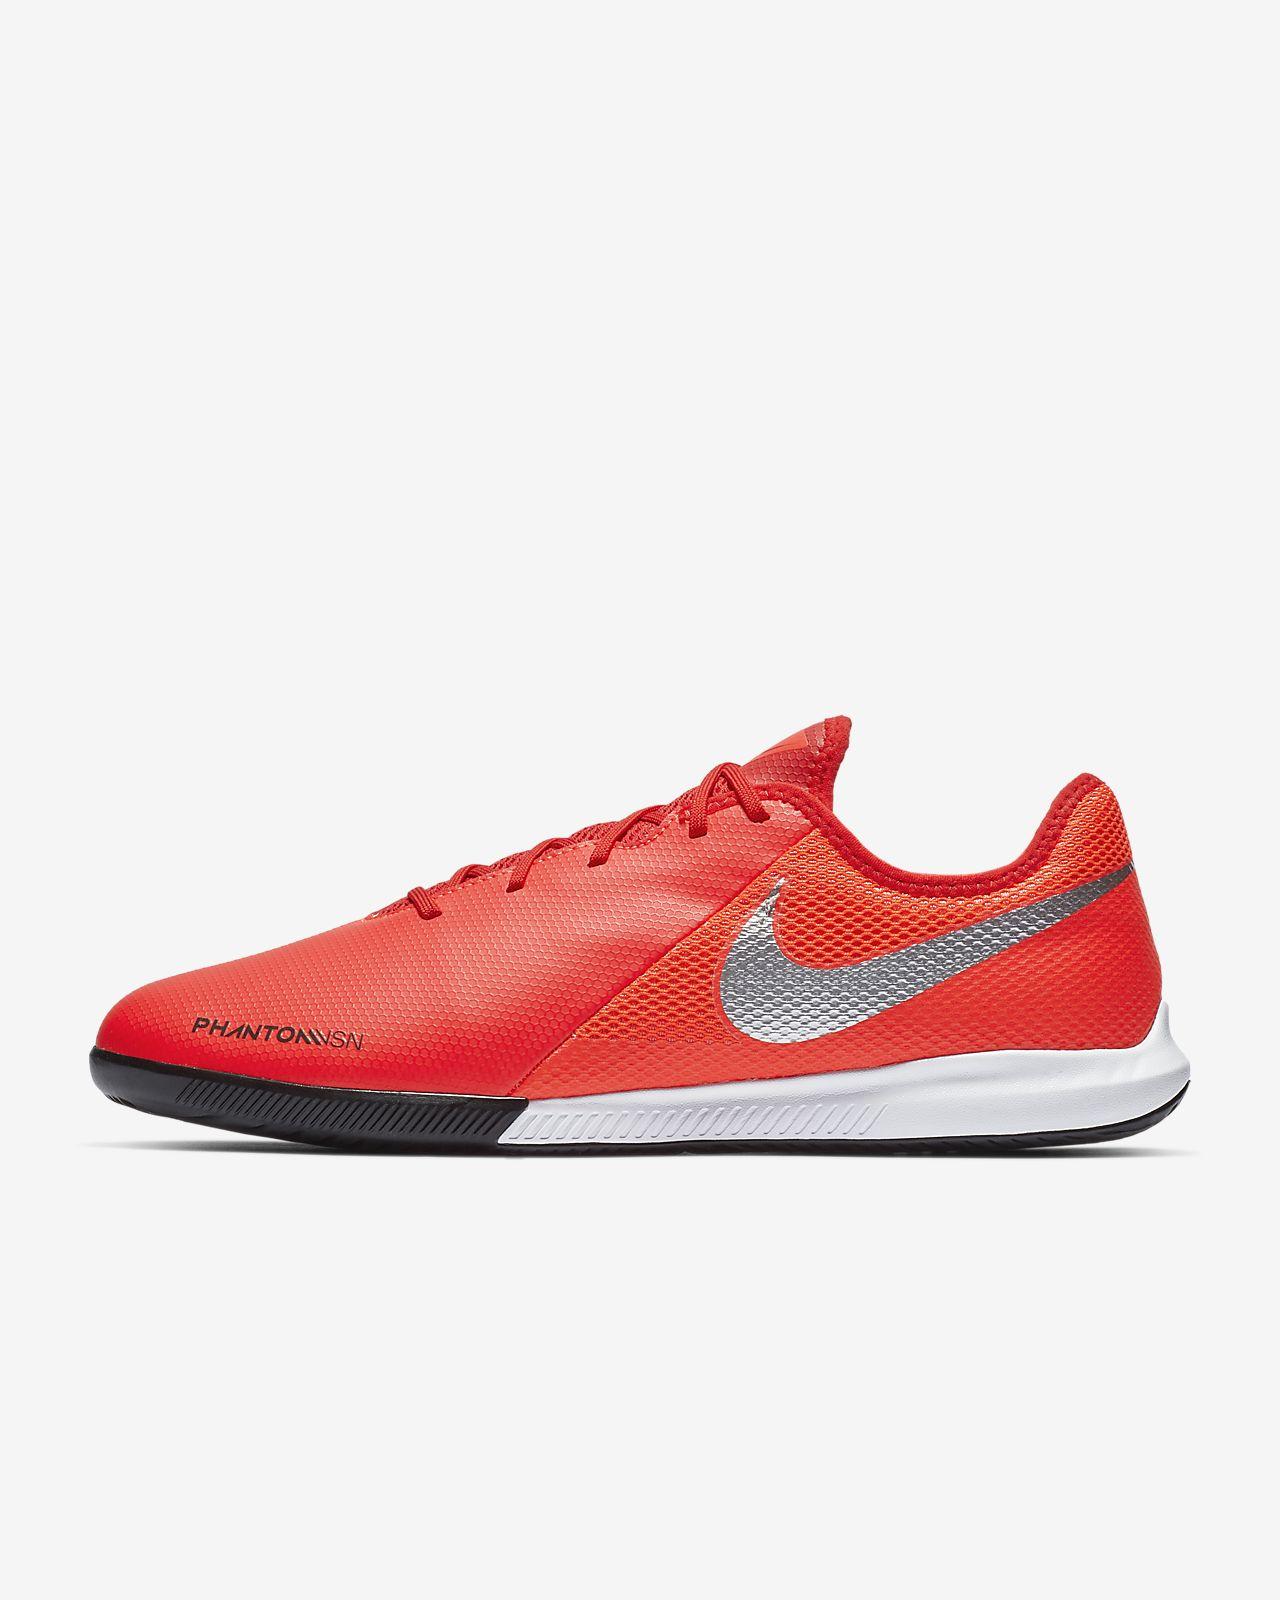 Da Per Indoorcemento Academy Campo Phantomvsn Calcio Nike Scarpa nkPNO80wX